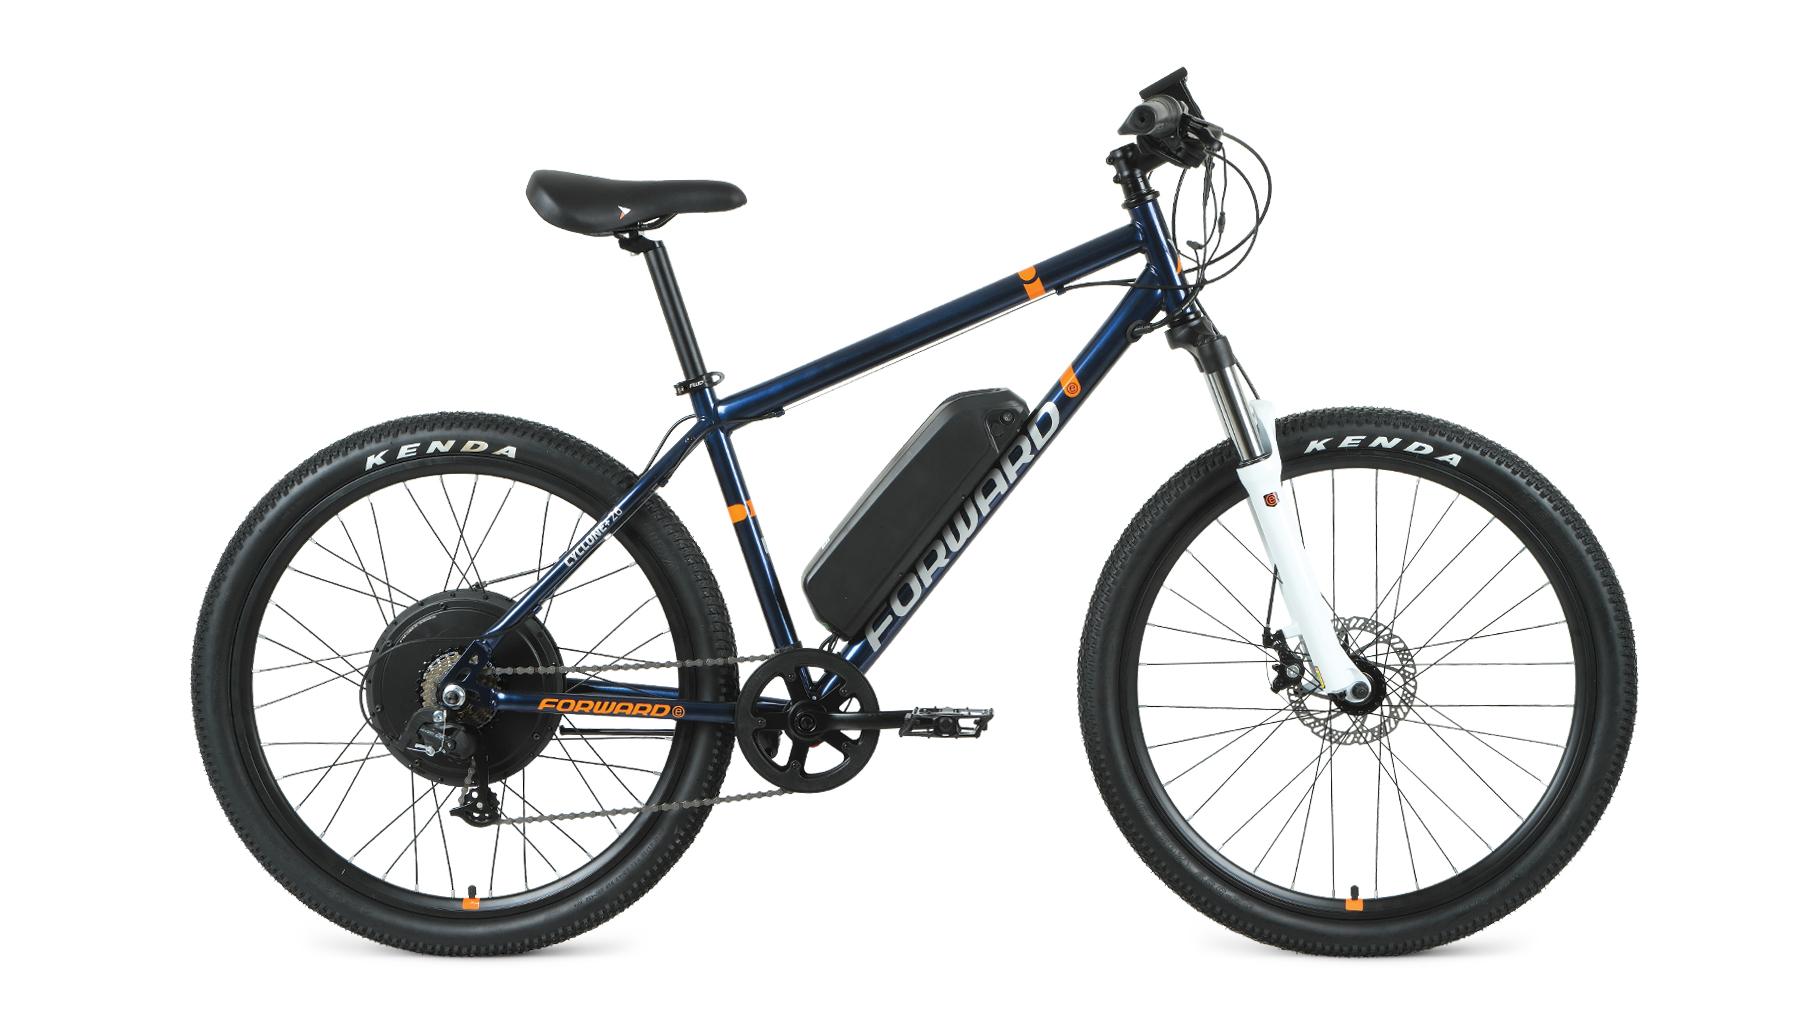 Электровелосипед Forward Cyclone Plus 26 2.0 disc 500w (2021)